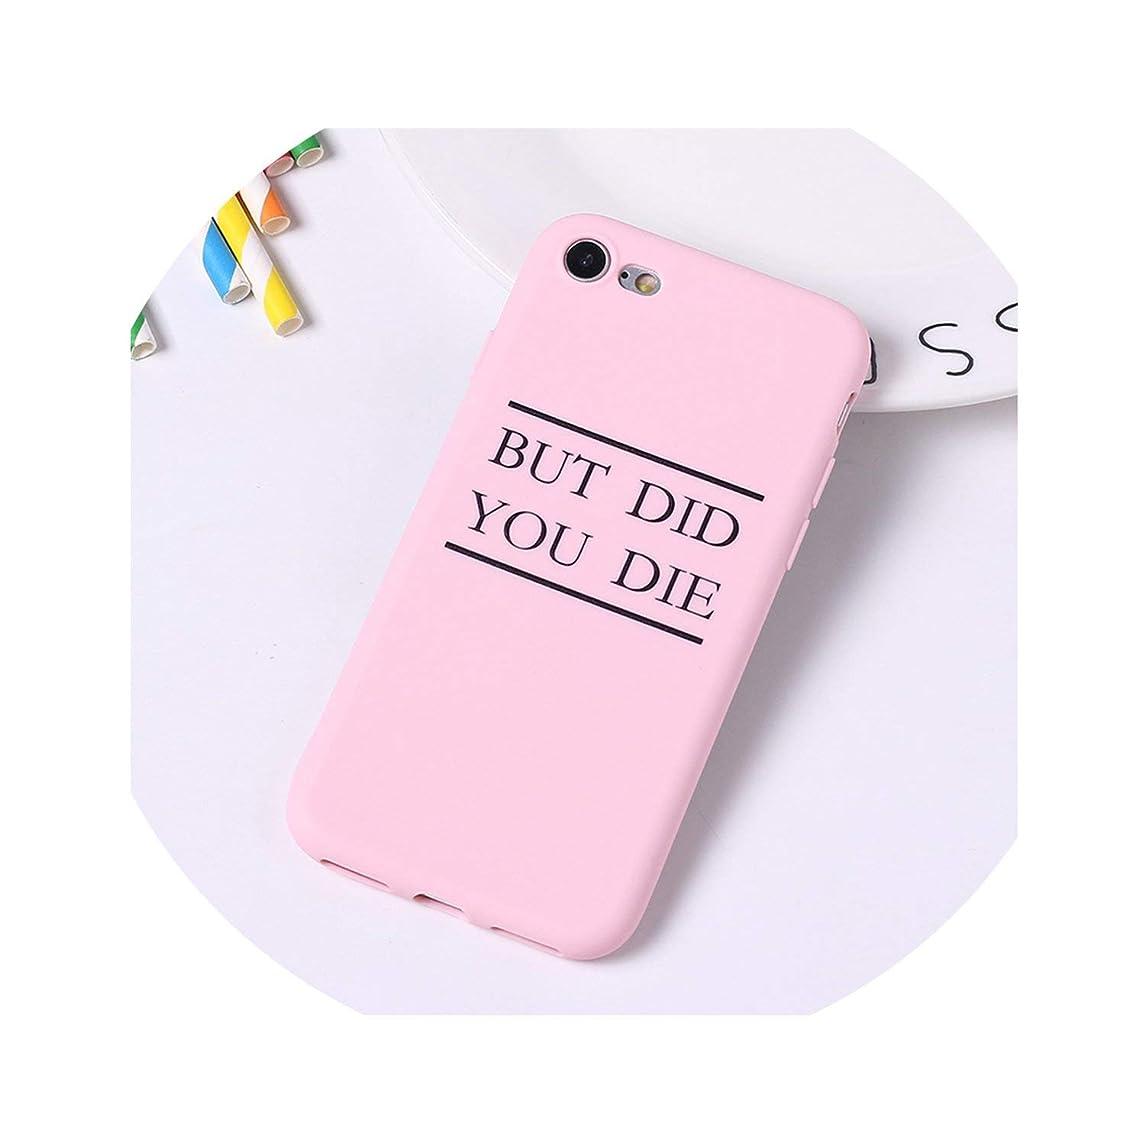 Cartoon Color Back Cover Letter Quote Soft Phone Case Fundas for iPhone 7 Plus 7 6Plus 8 8Plus X Xs Max,13,for iPhone 8Plus